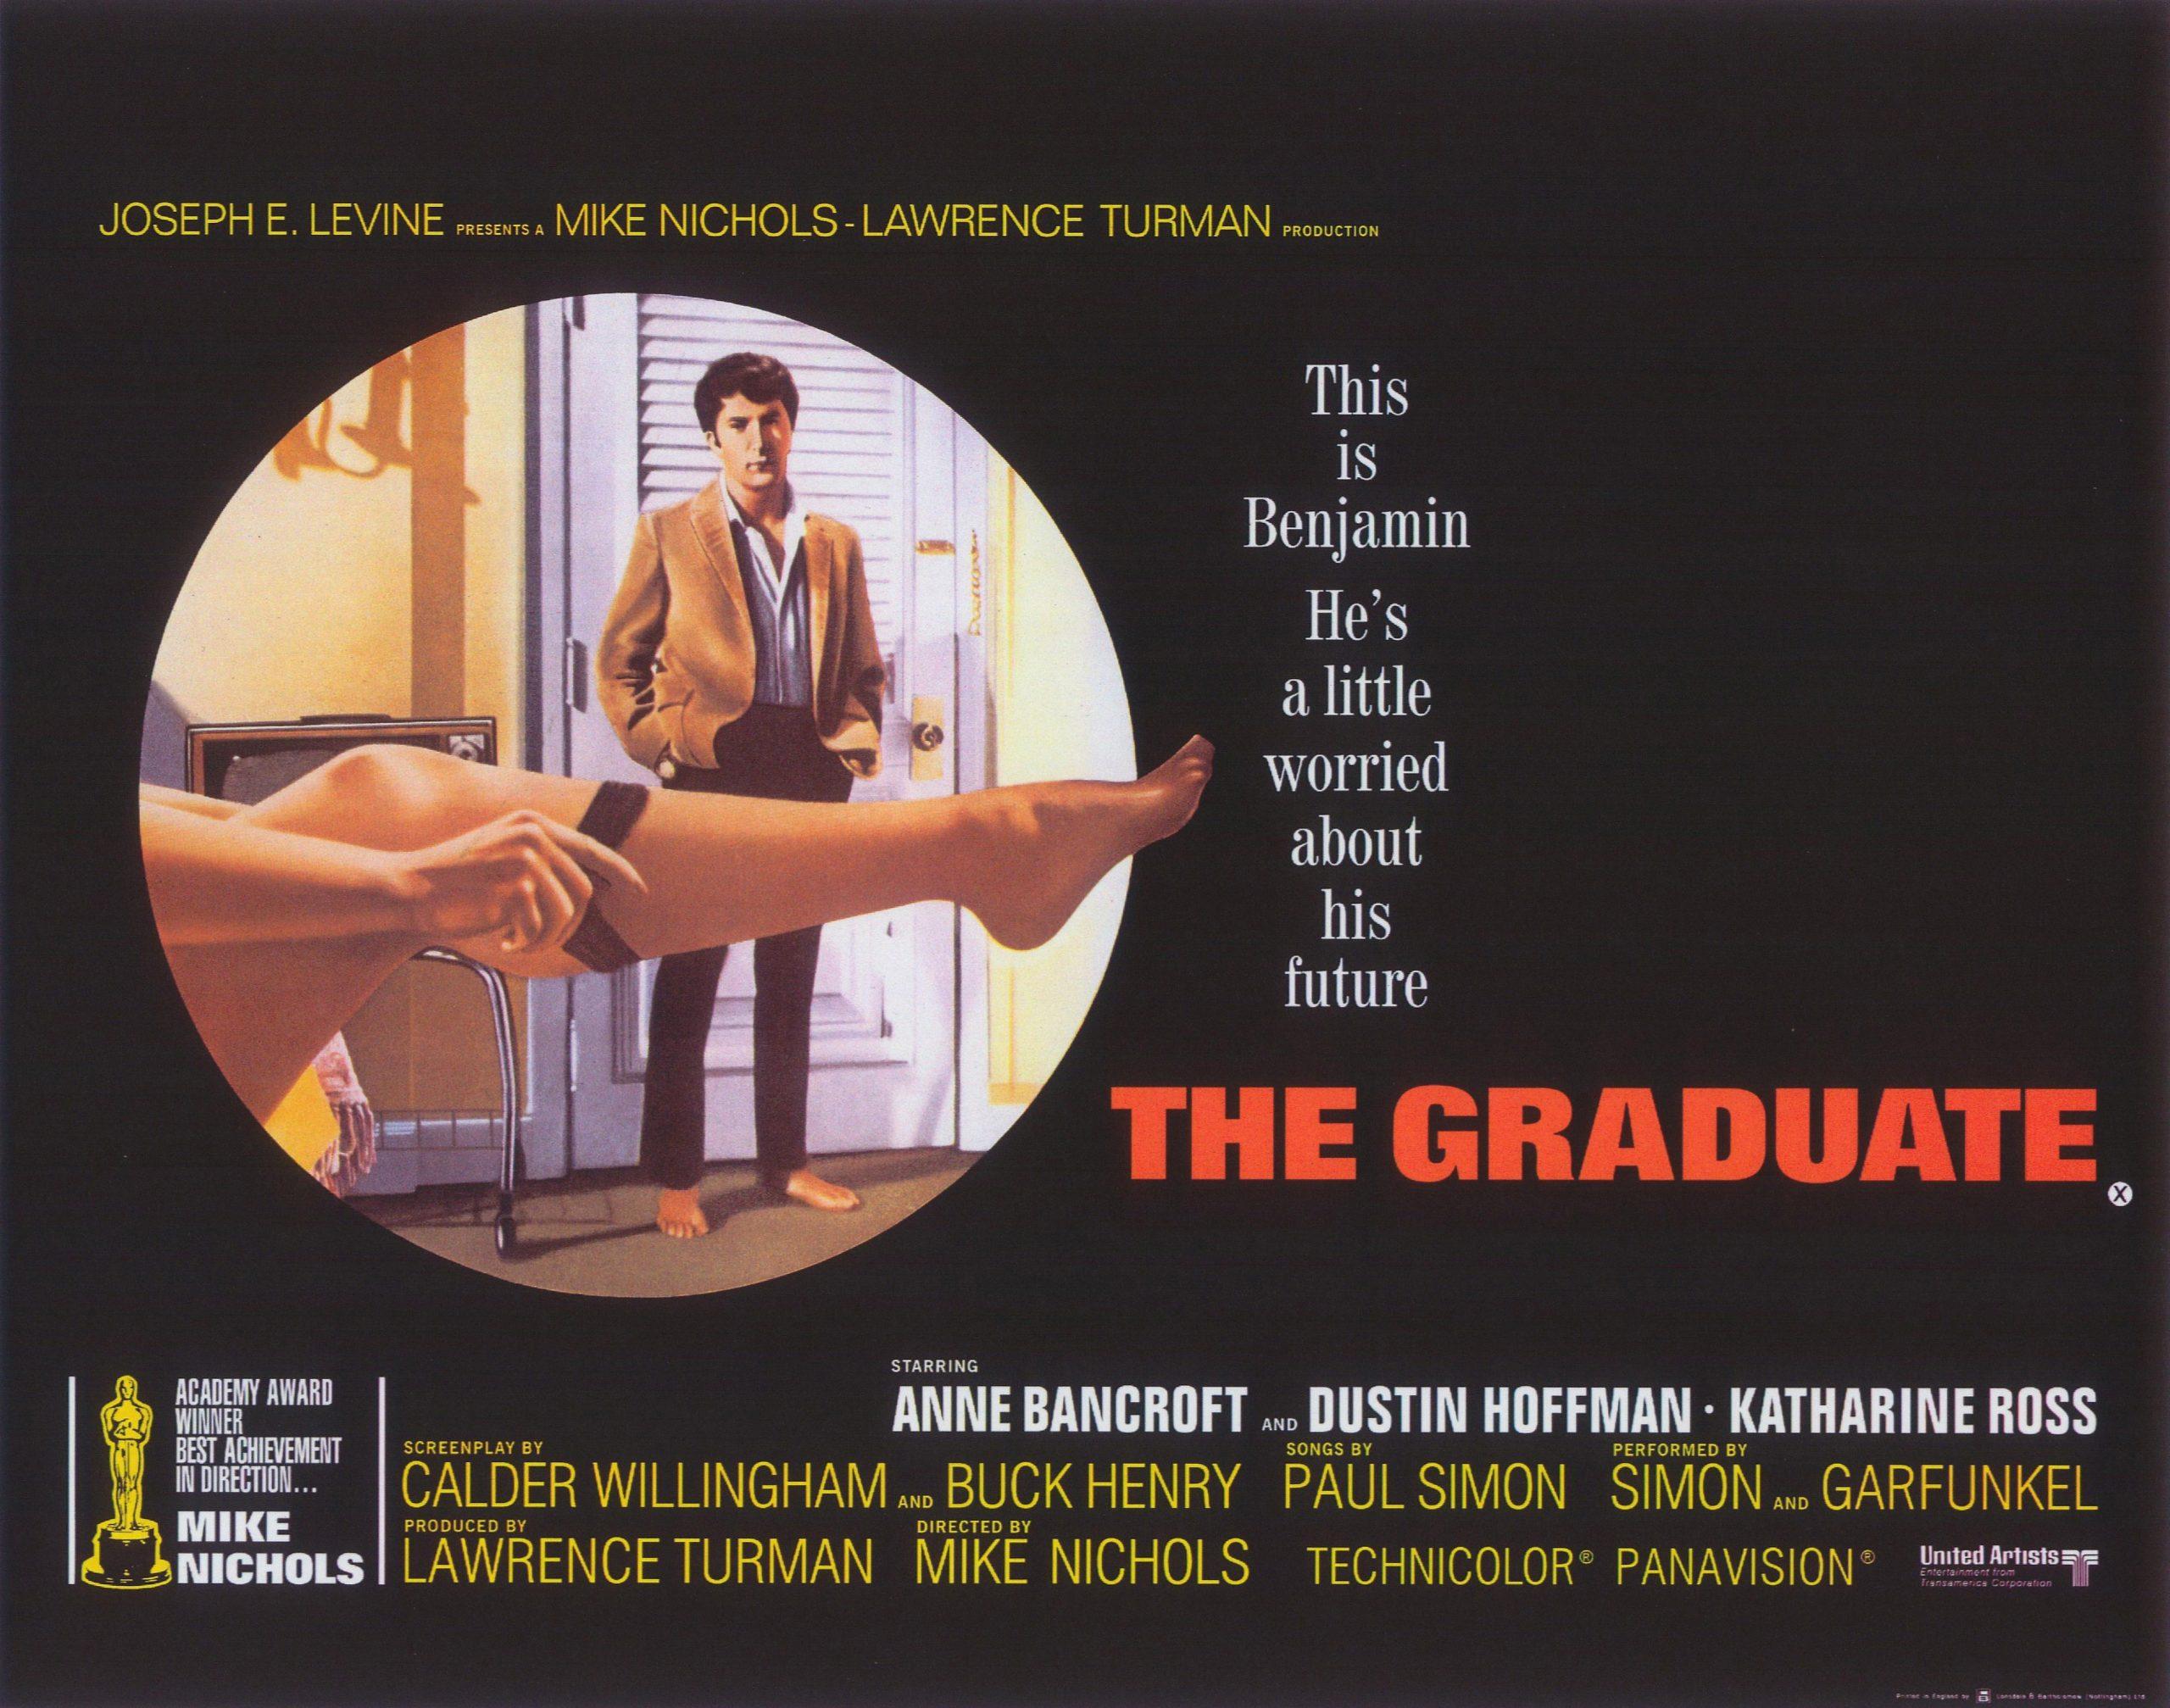 The original Graduate poster